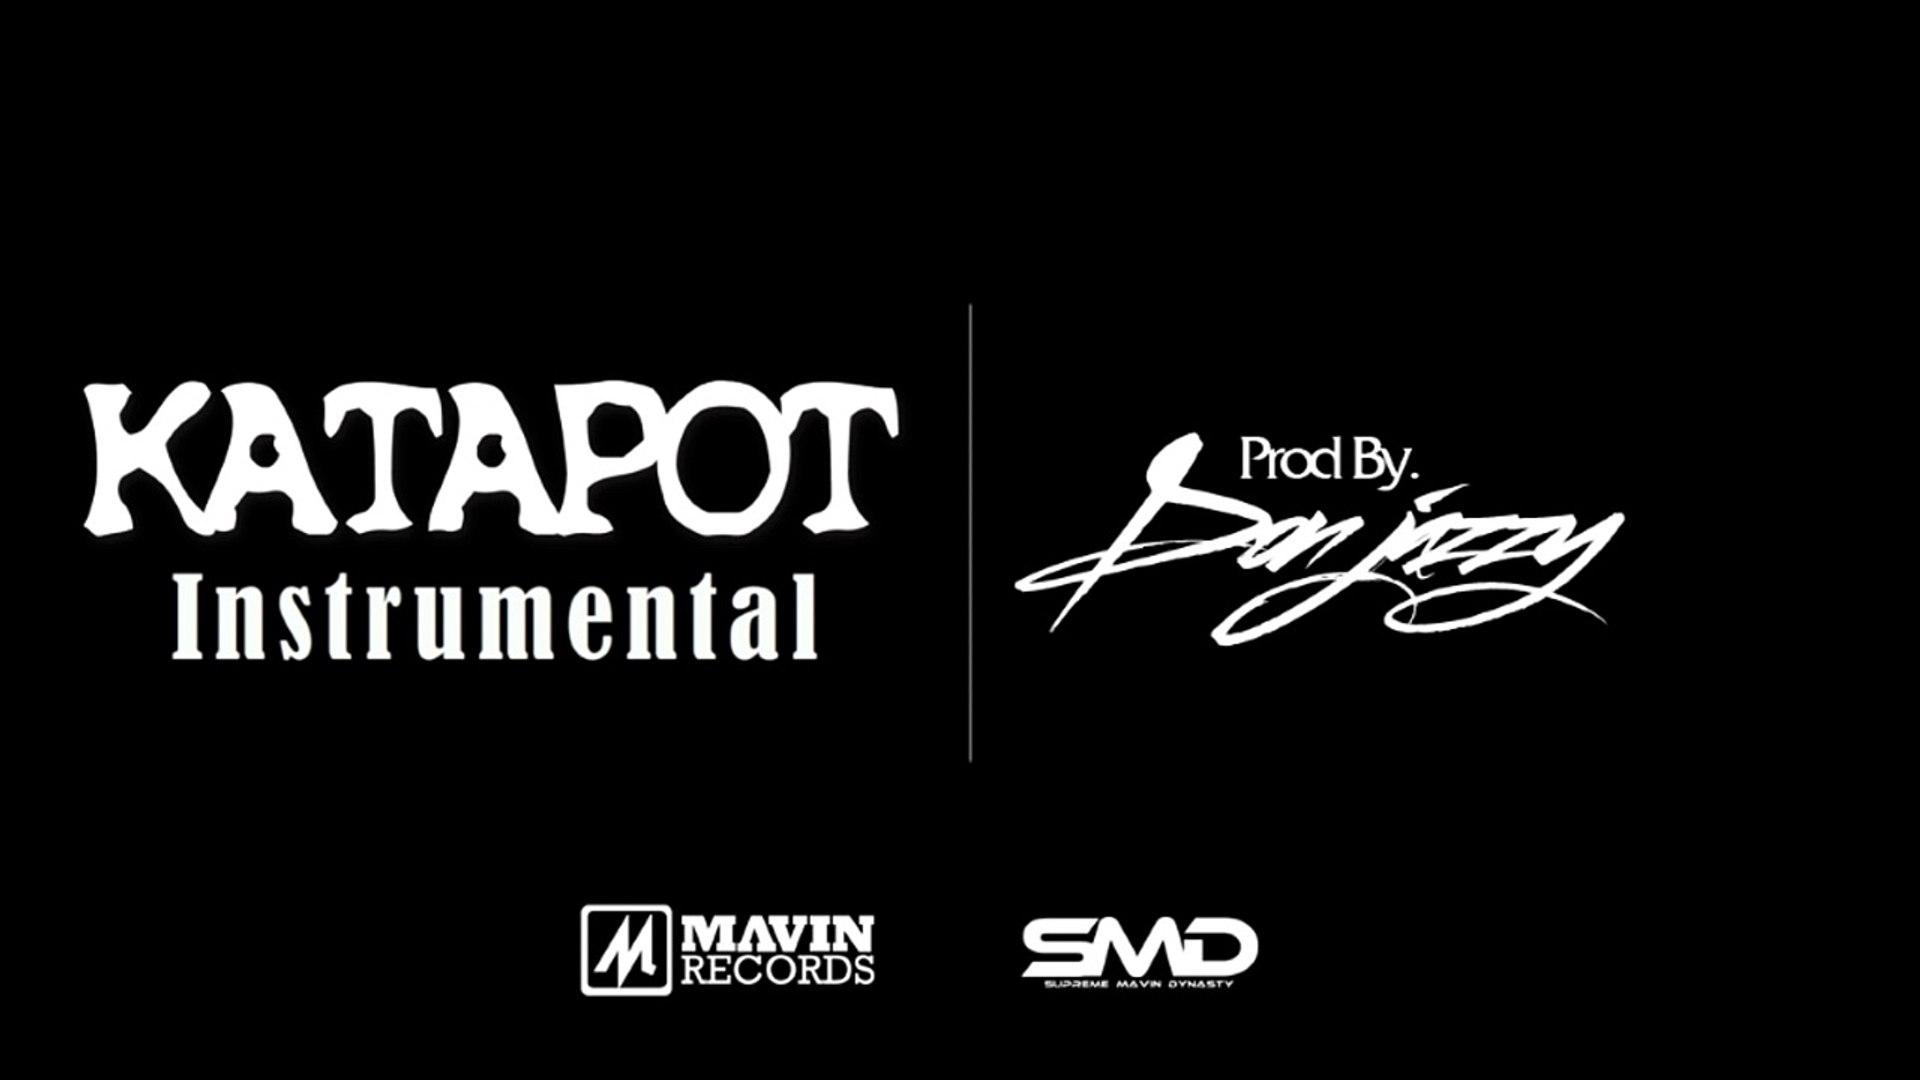 Katapot Instrumental - Produced by Don Jazzy